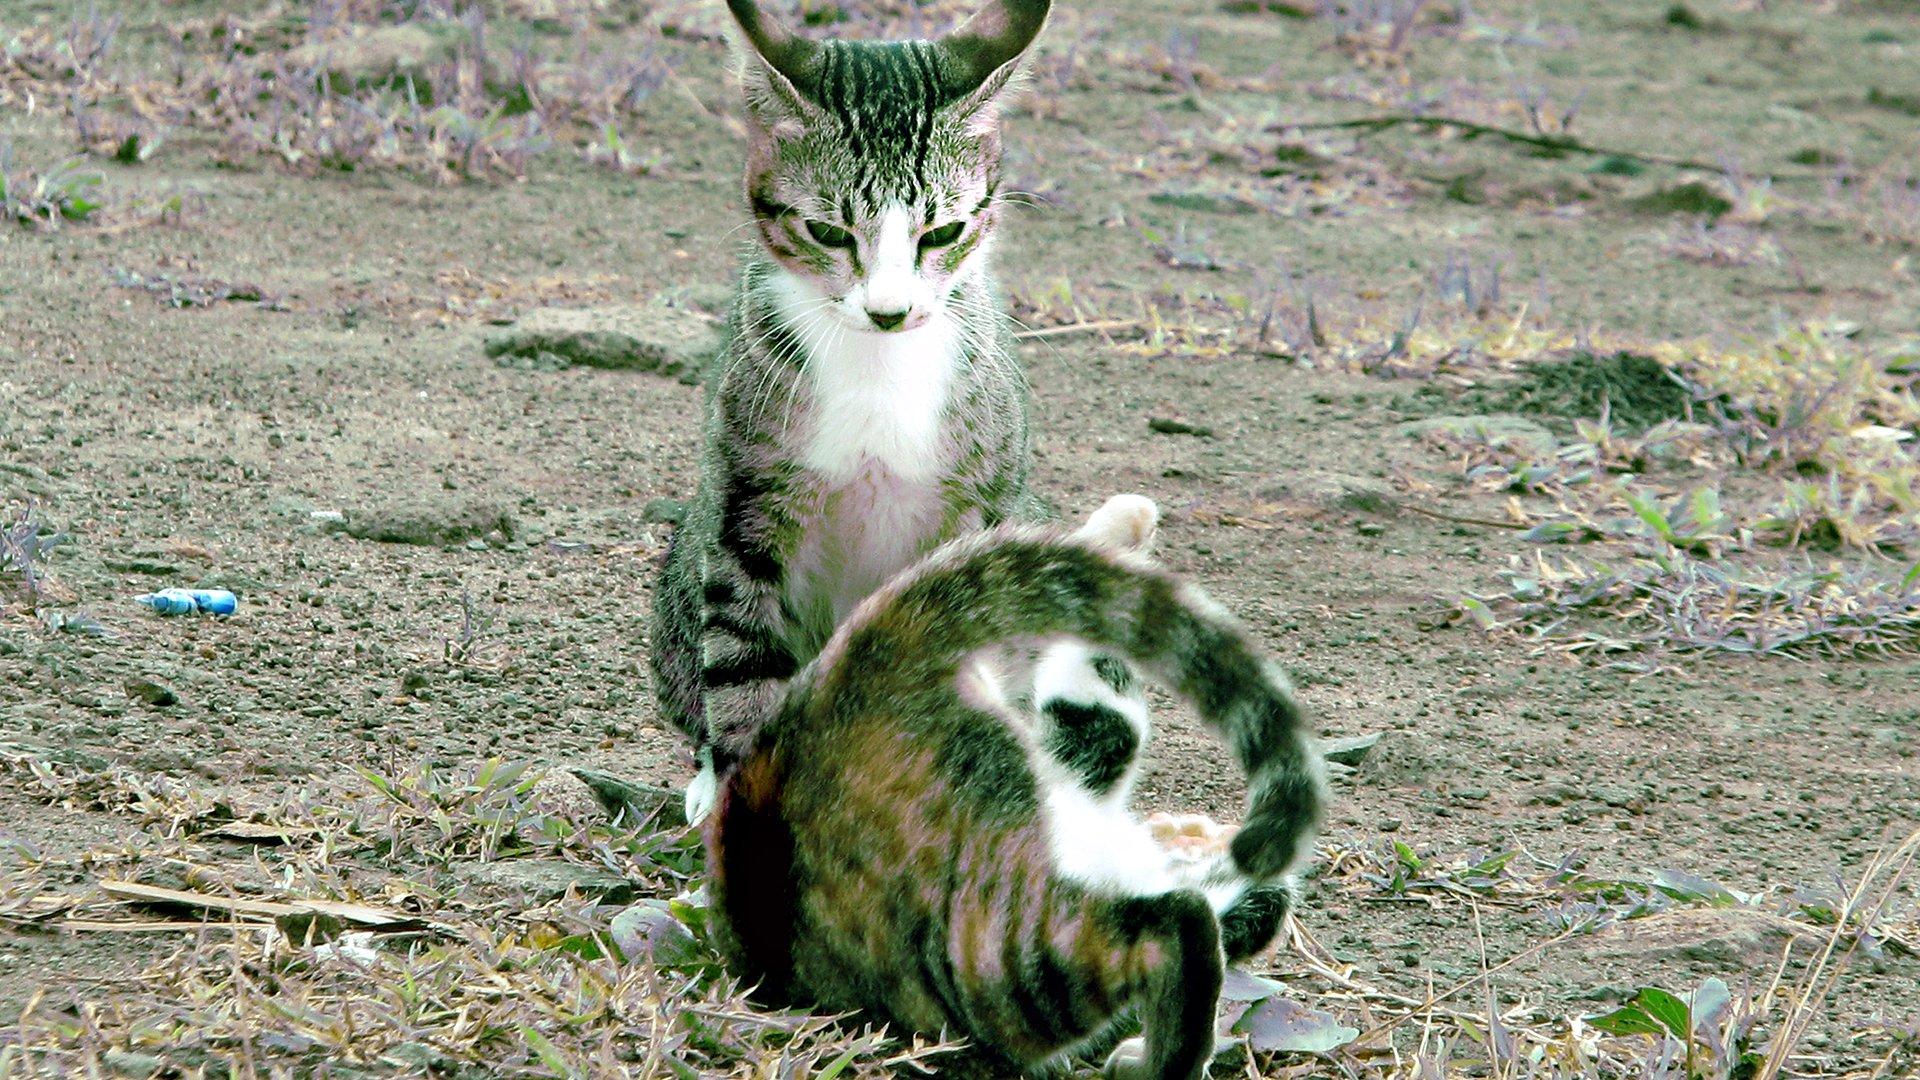 Animali - Gatto  Sfondo